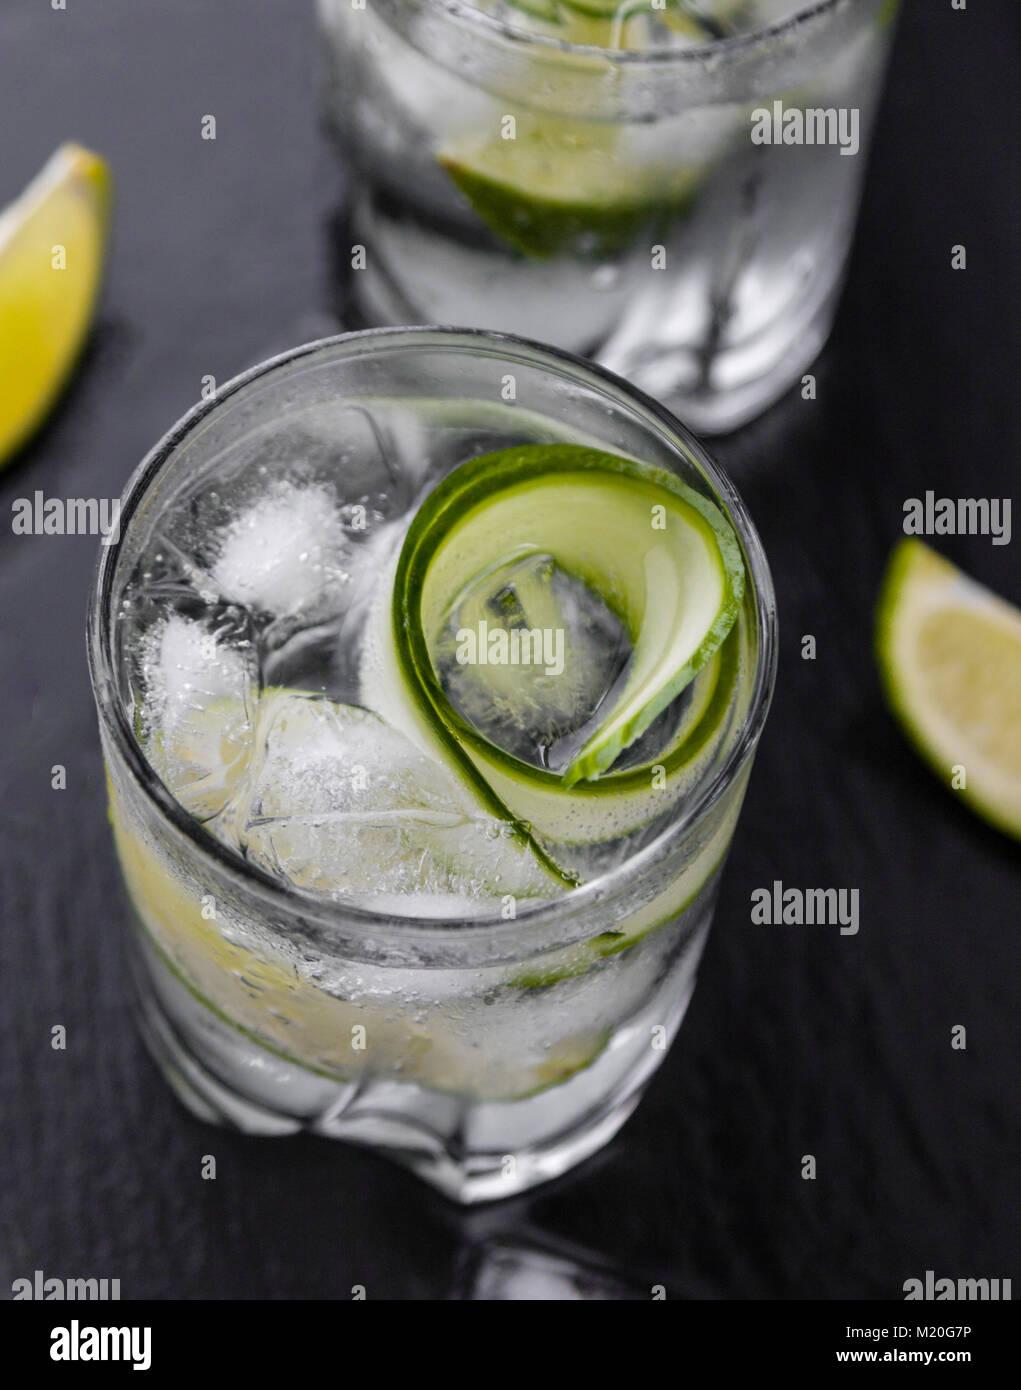 Gin Tonic con pepino, limón y hielo en vidrio Imagen De Stock